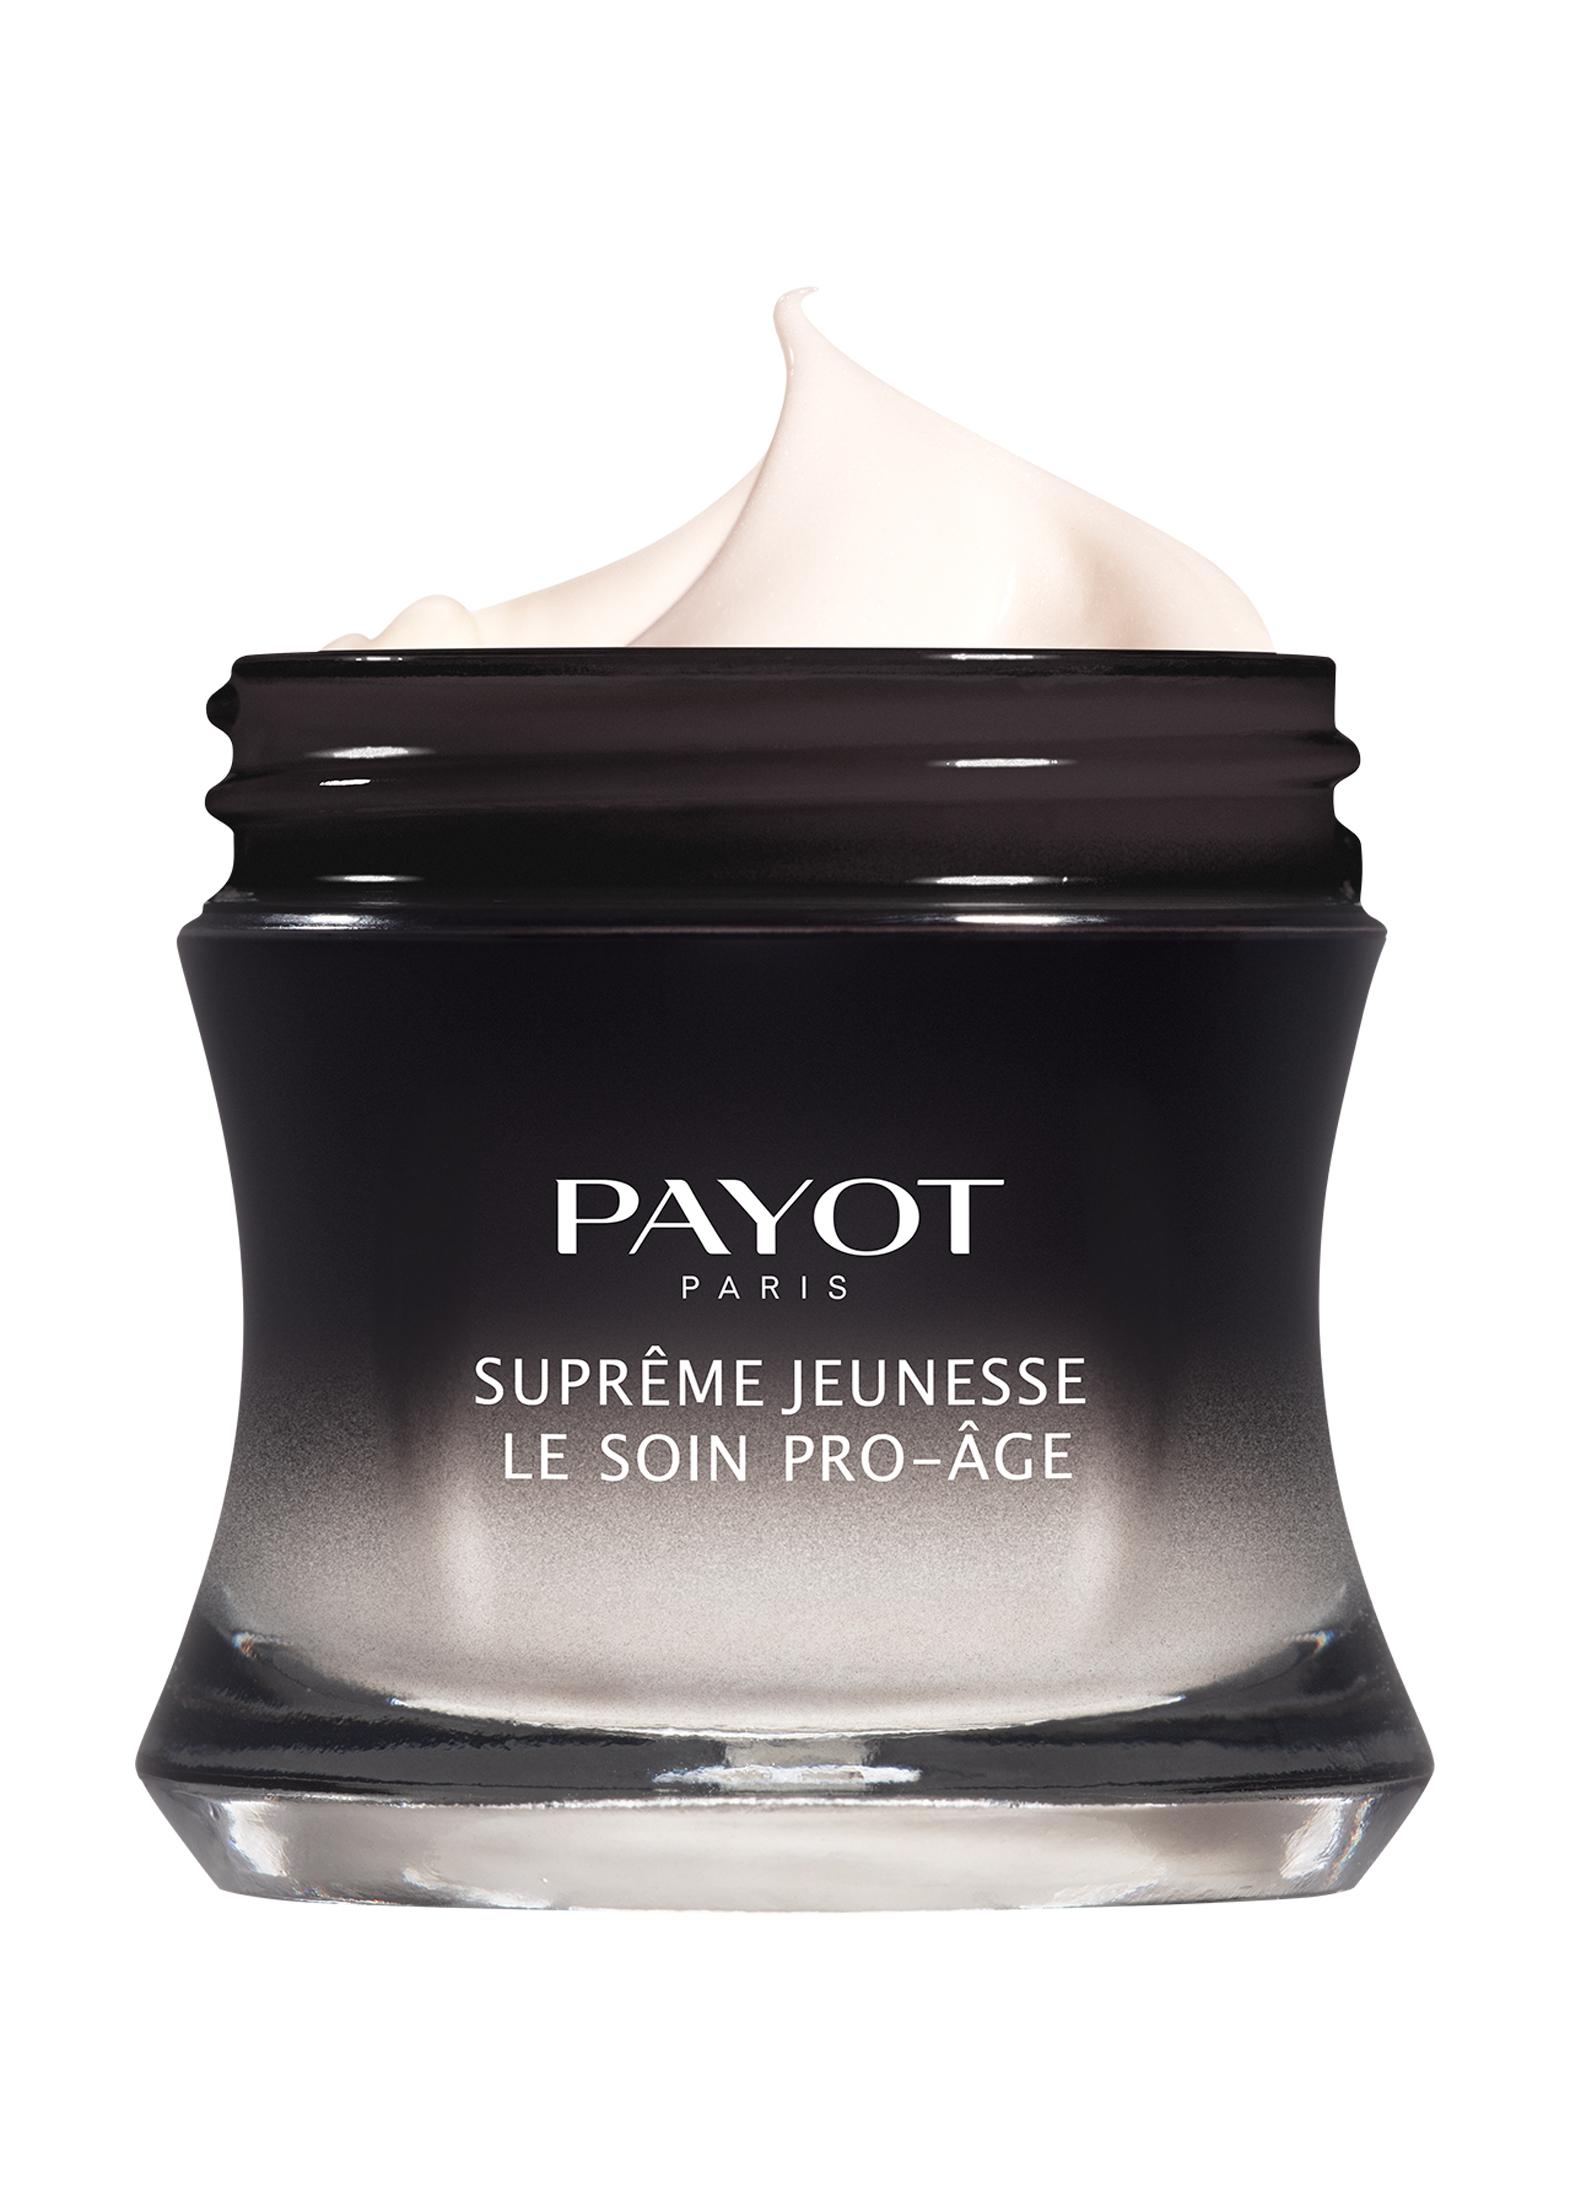 Supreme Jeunesse Le Soin Pro-Age, 50ml image number 1